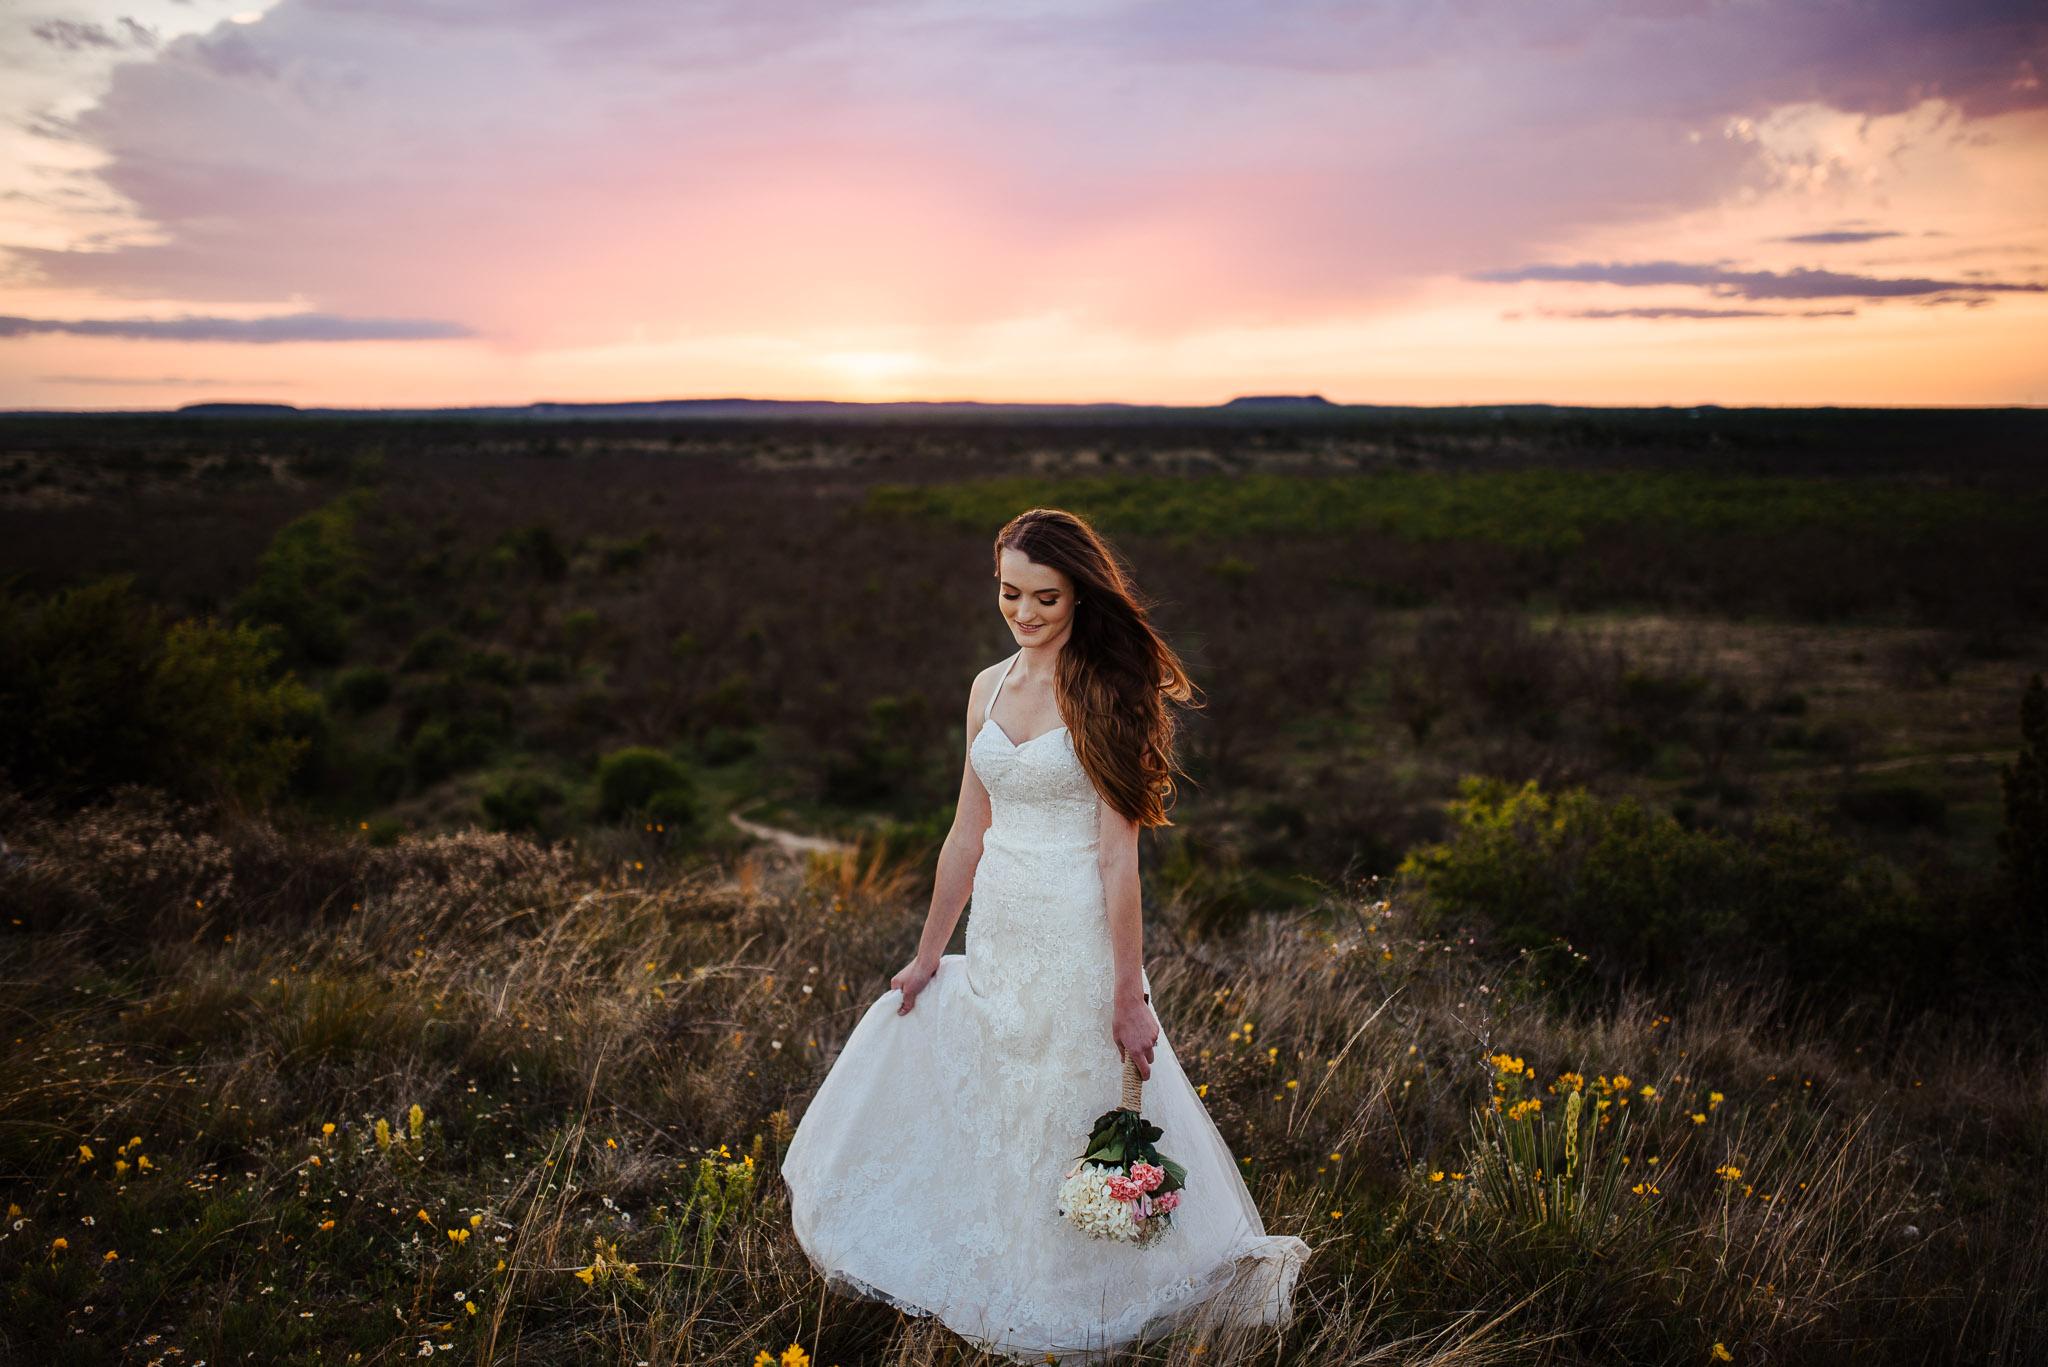 West-Texas-Wedding-Photographer-0014.jpg